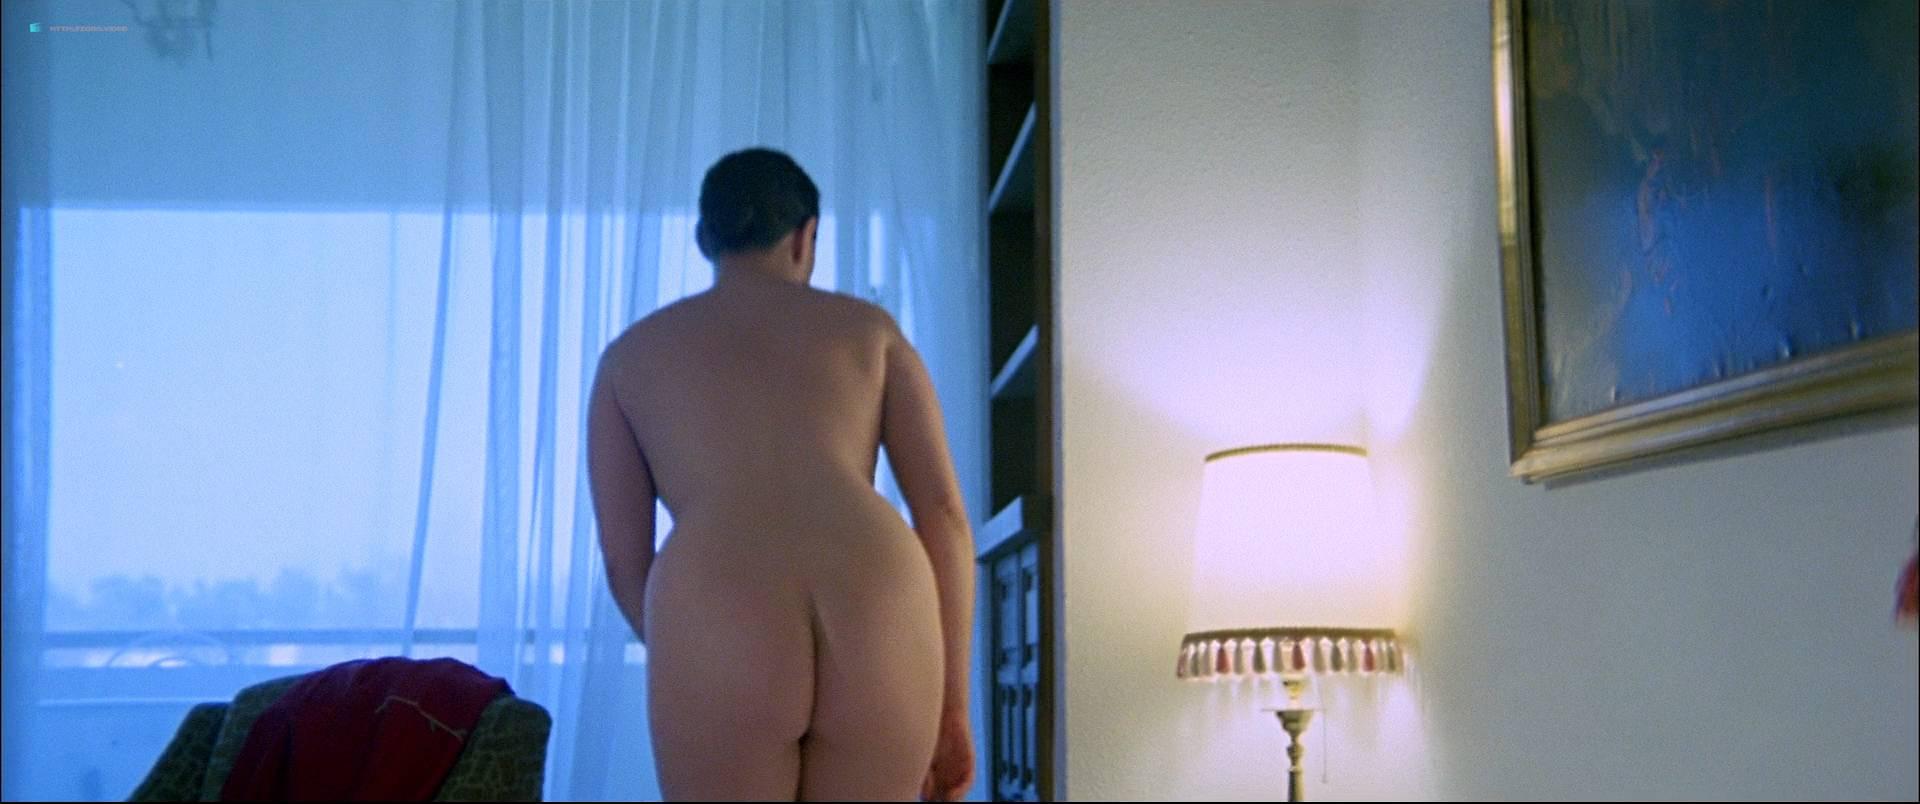 Lina Romay nude full frontal Mari Carmen Nieto, Alicia Príncipe nude too - Night of 1,000 Sexes (SP-1984) HD 1080p BluRay (17)